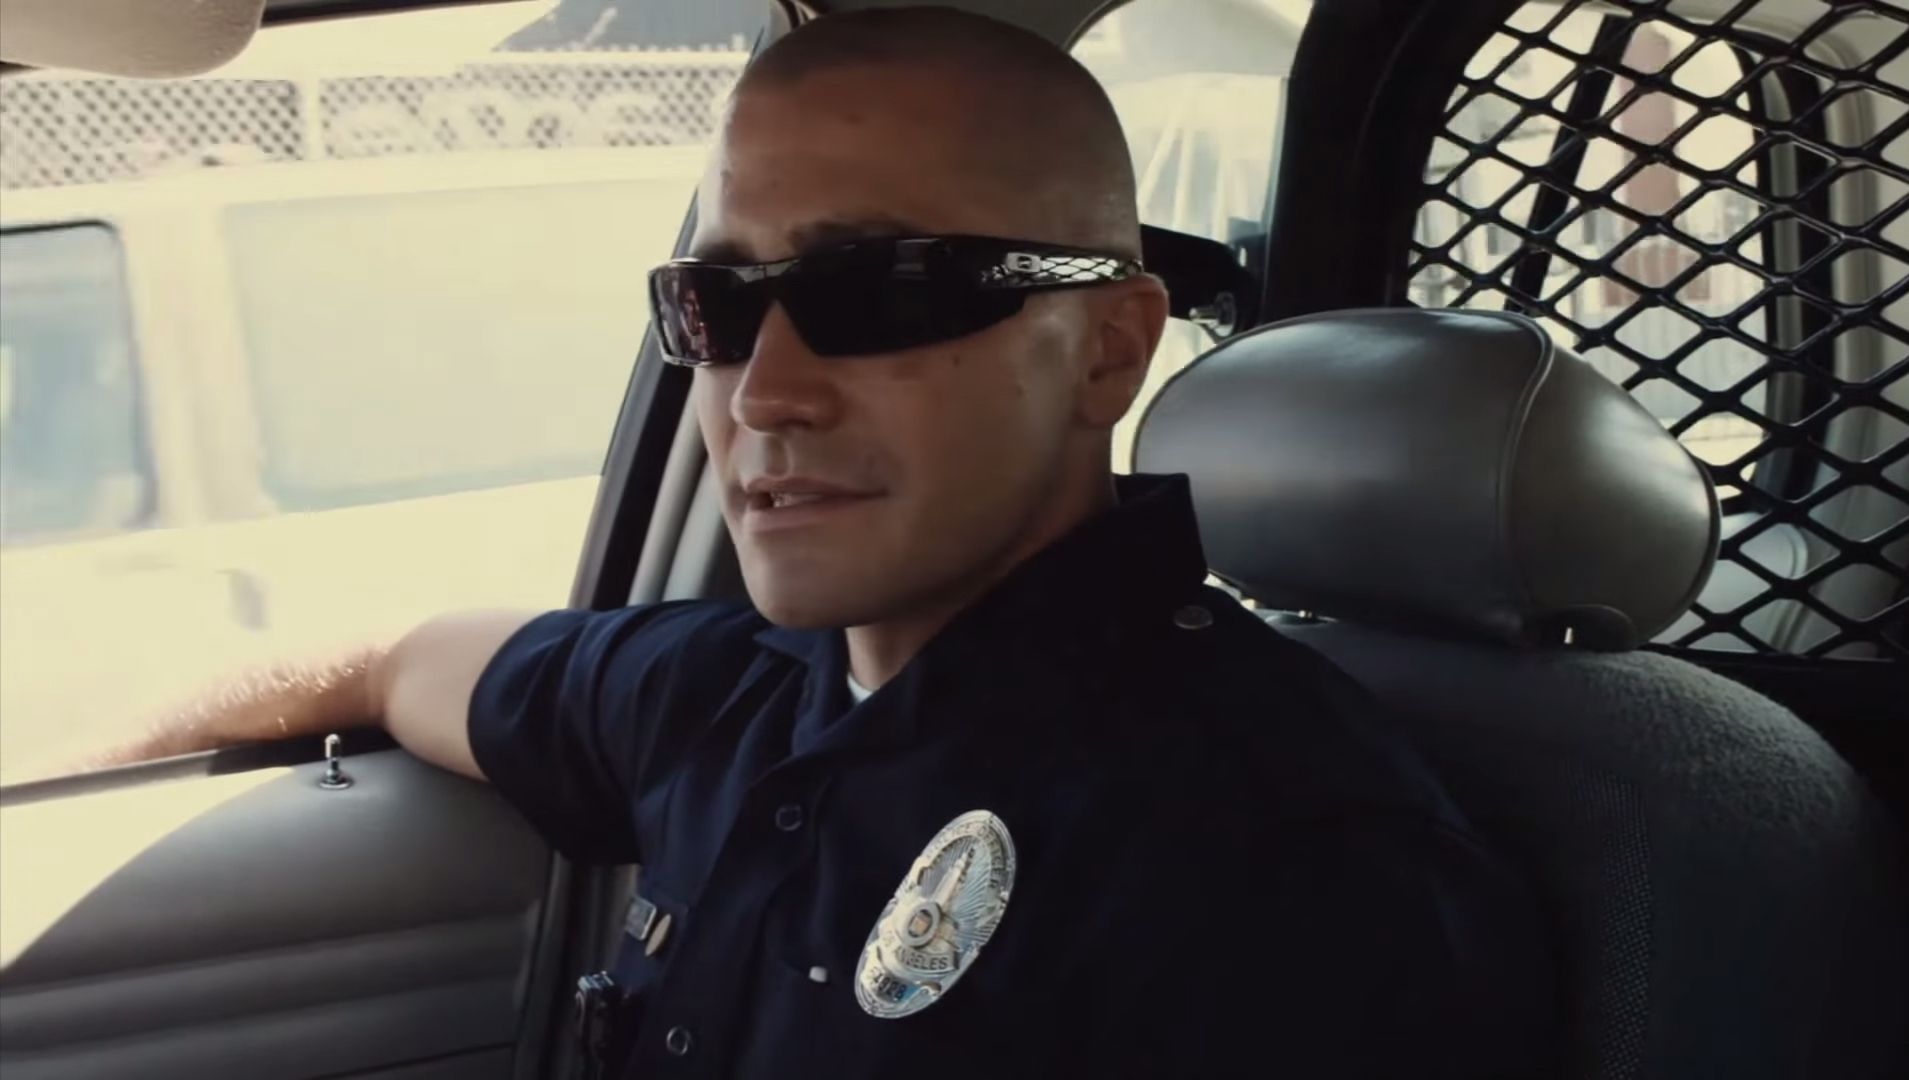 oakley gascan sunglasses review gwy0  The Oakley sunglasses that Jake Gyllenhaal Brian Taylor wears in End of  Watch